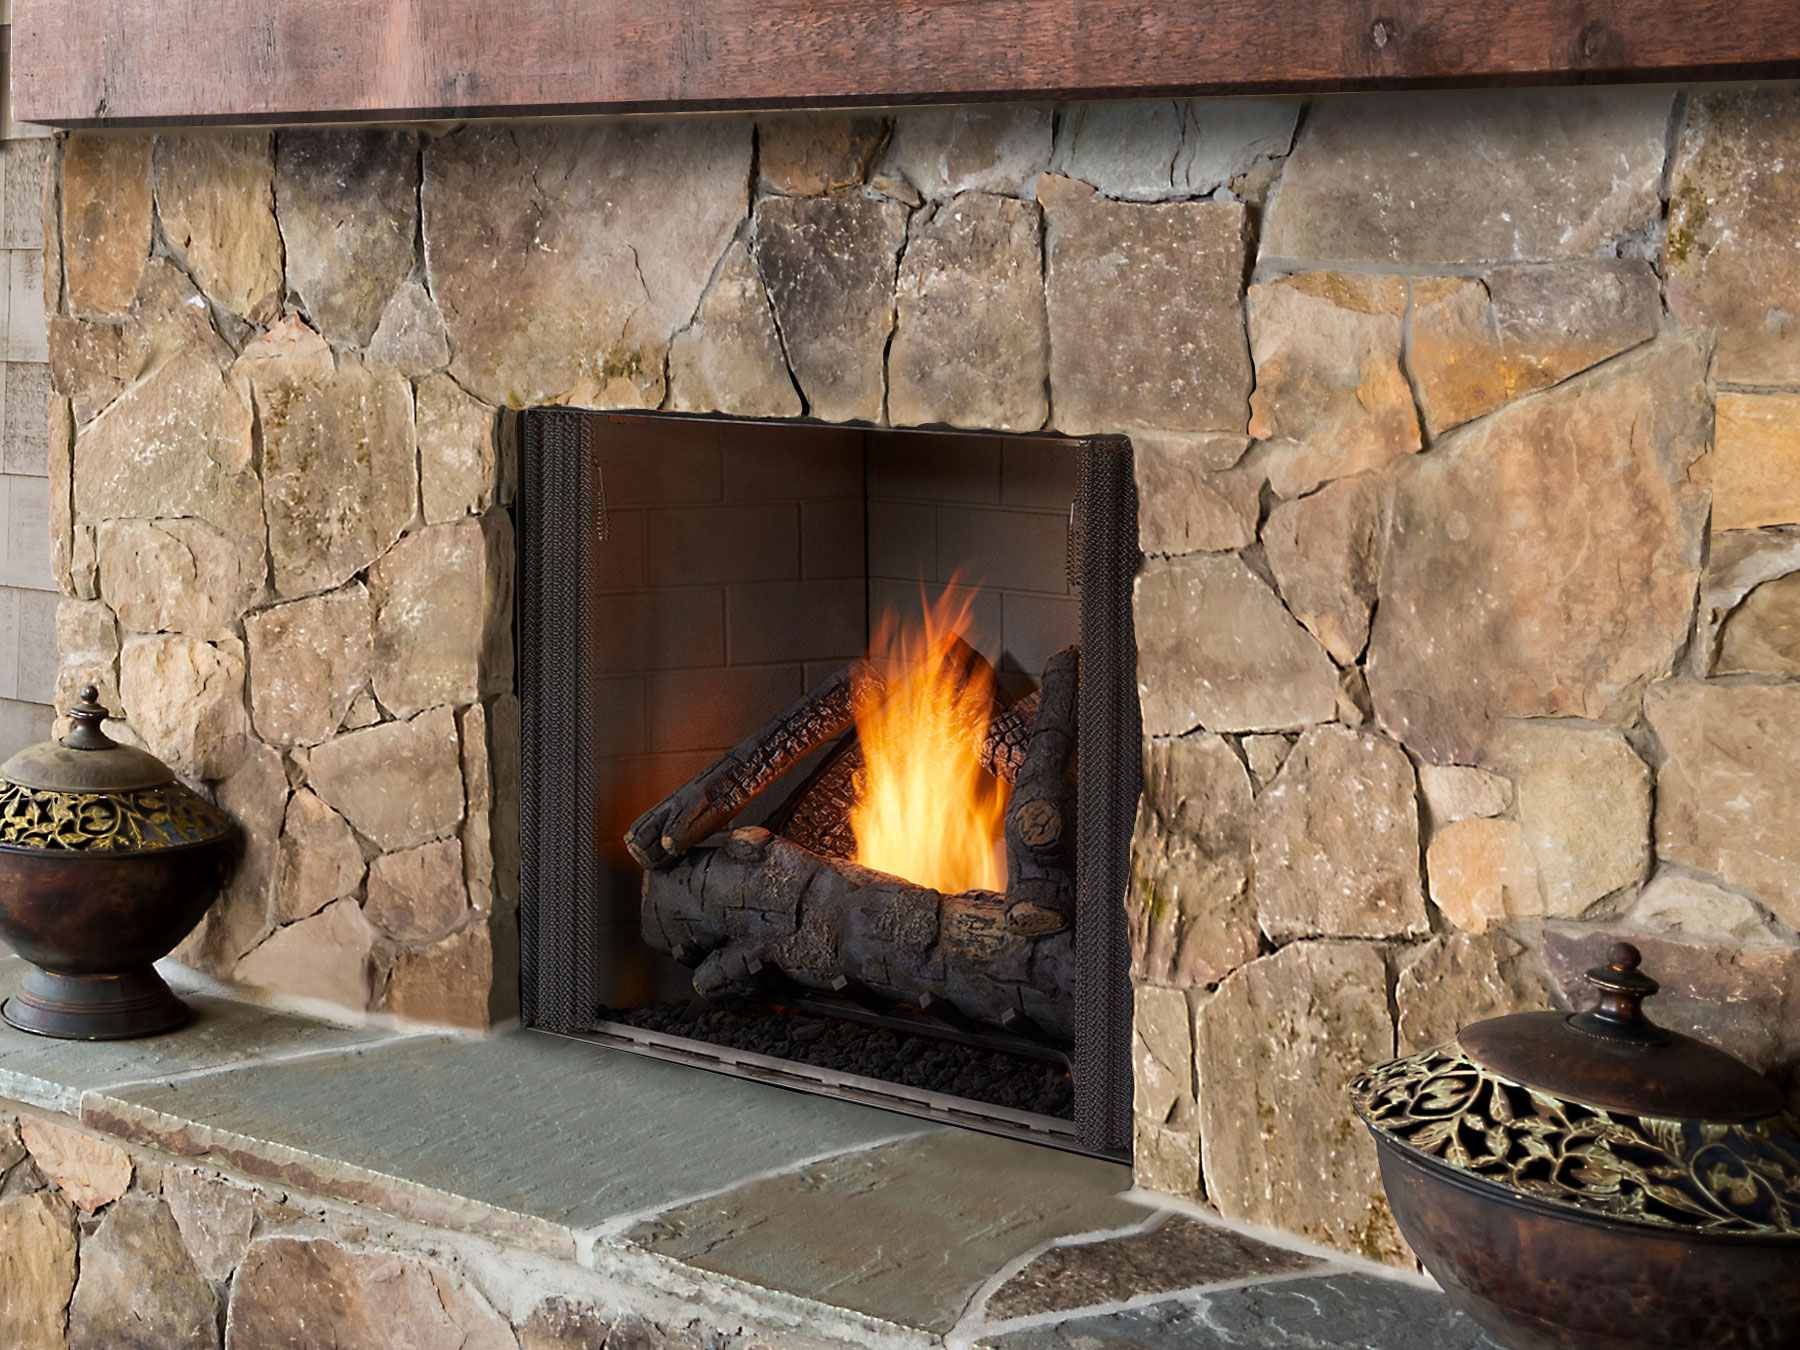 Courtyard 36 Standard interior standard logs Room 4C Low Res